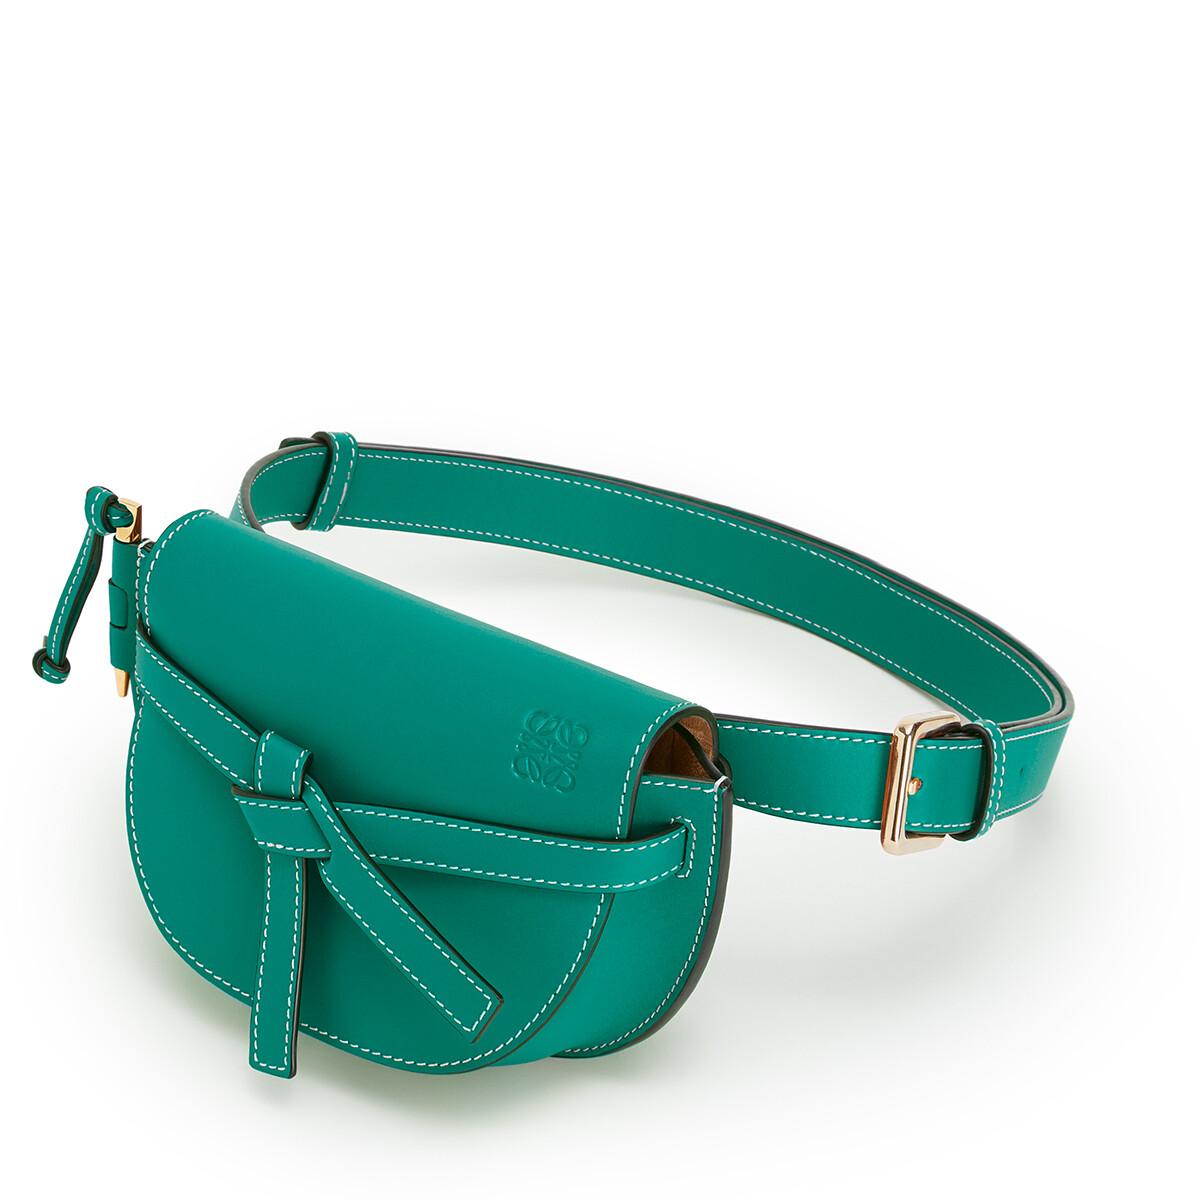 LOEWE ゲート バンバッグ emerald green front